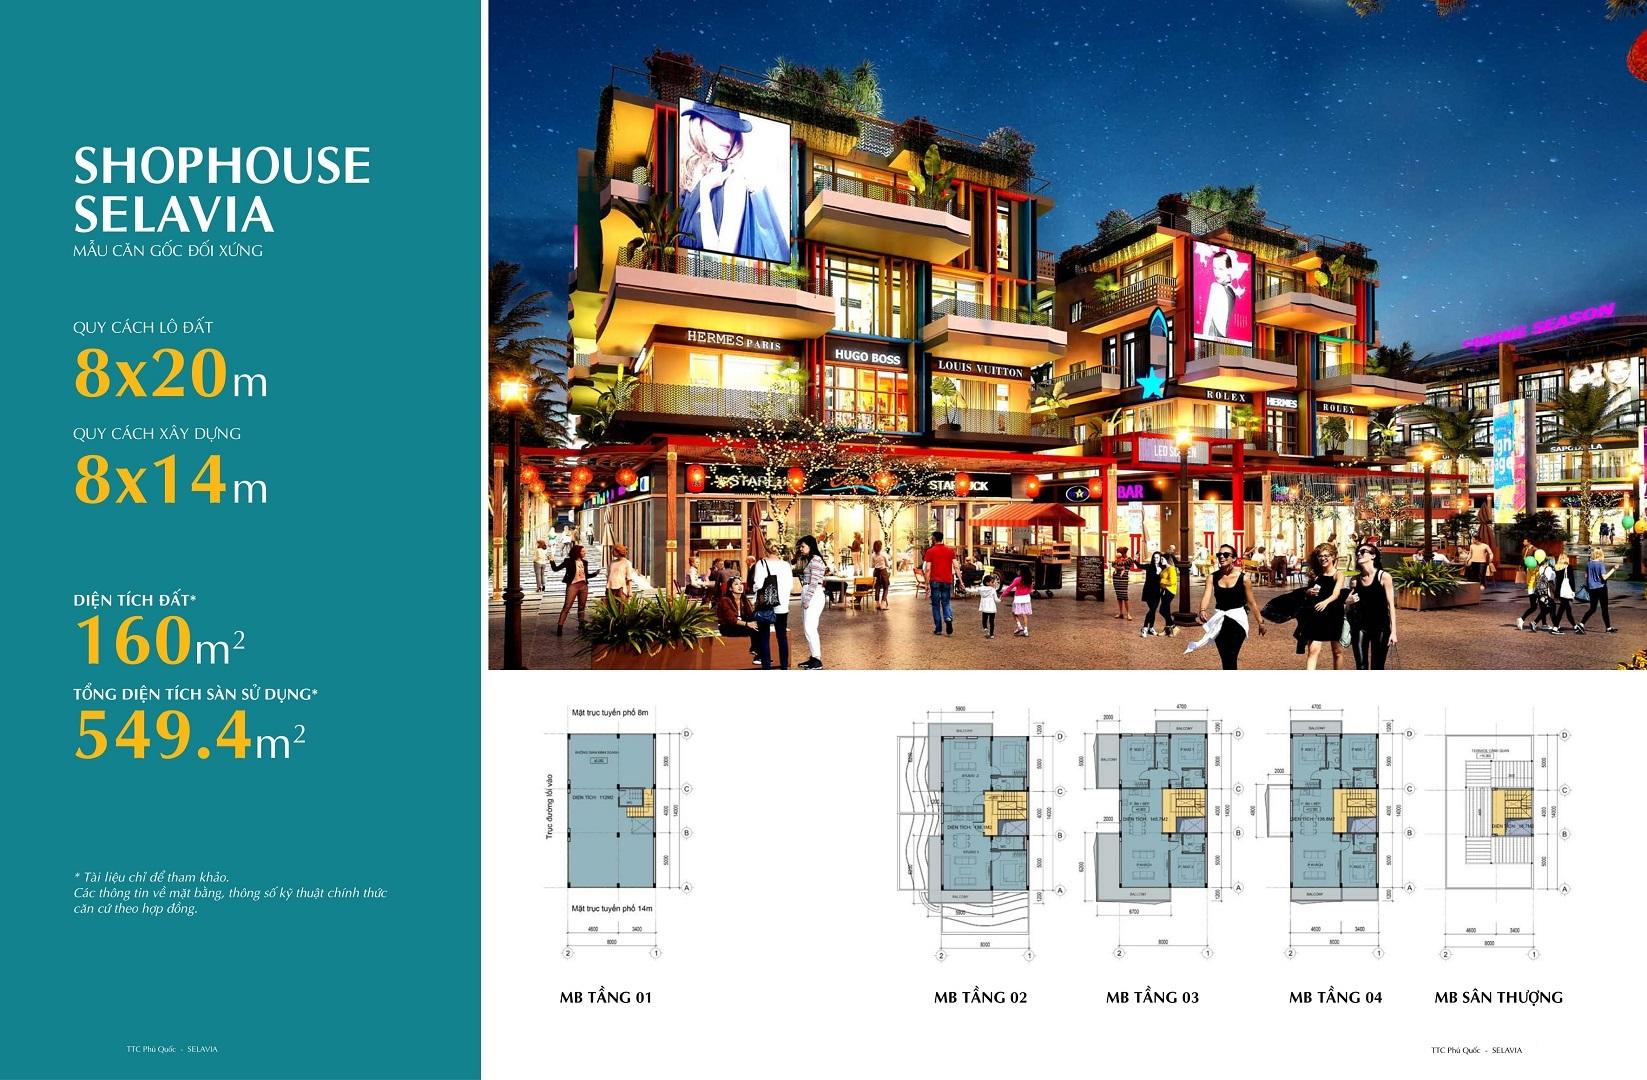 thiết kế shophouse selavia phú quốc mẫu 1